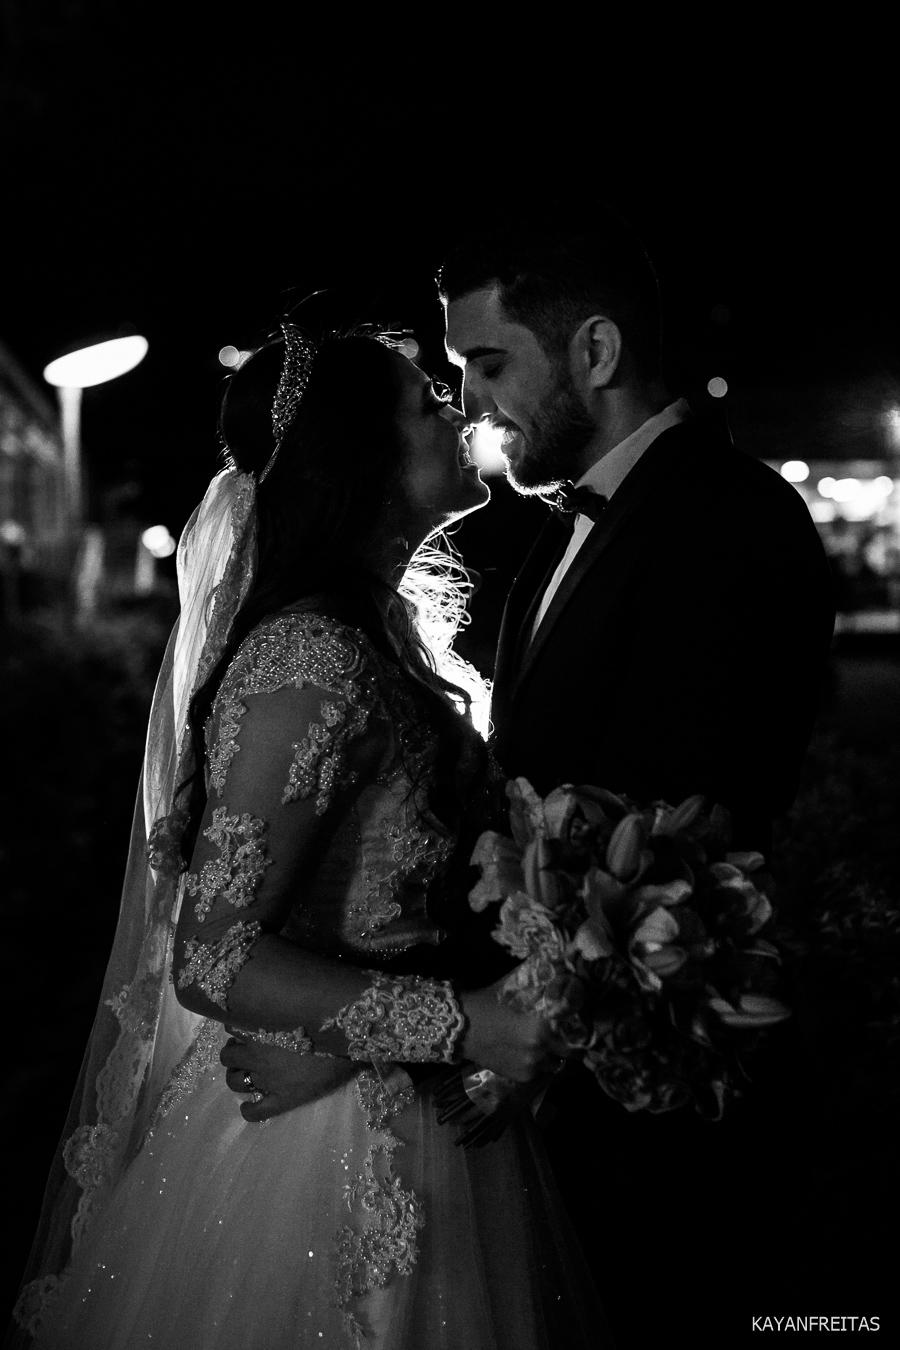 casamento-lic-florianopolis-ariane-diogo-0079 Casamento Ariane e Diogo - LIC Florianópolis